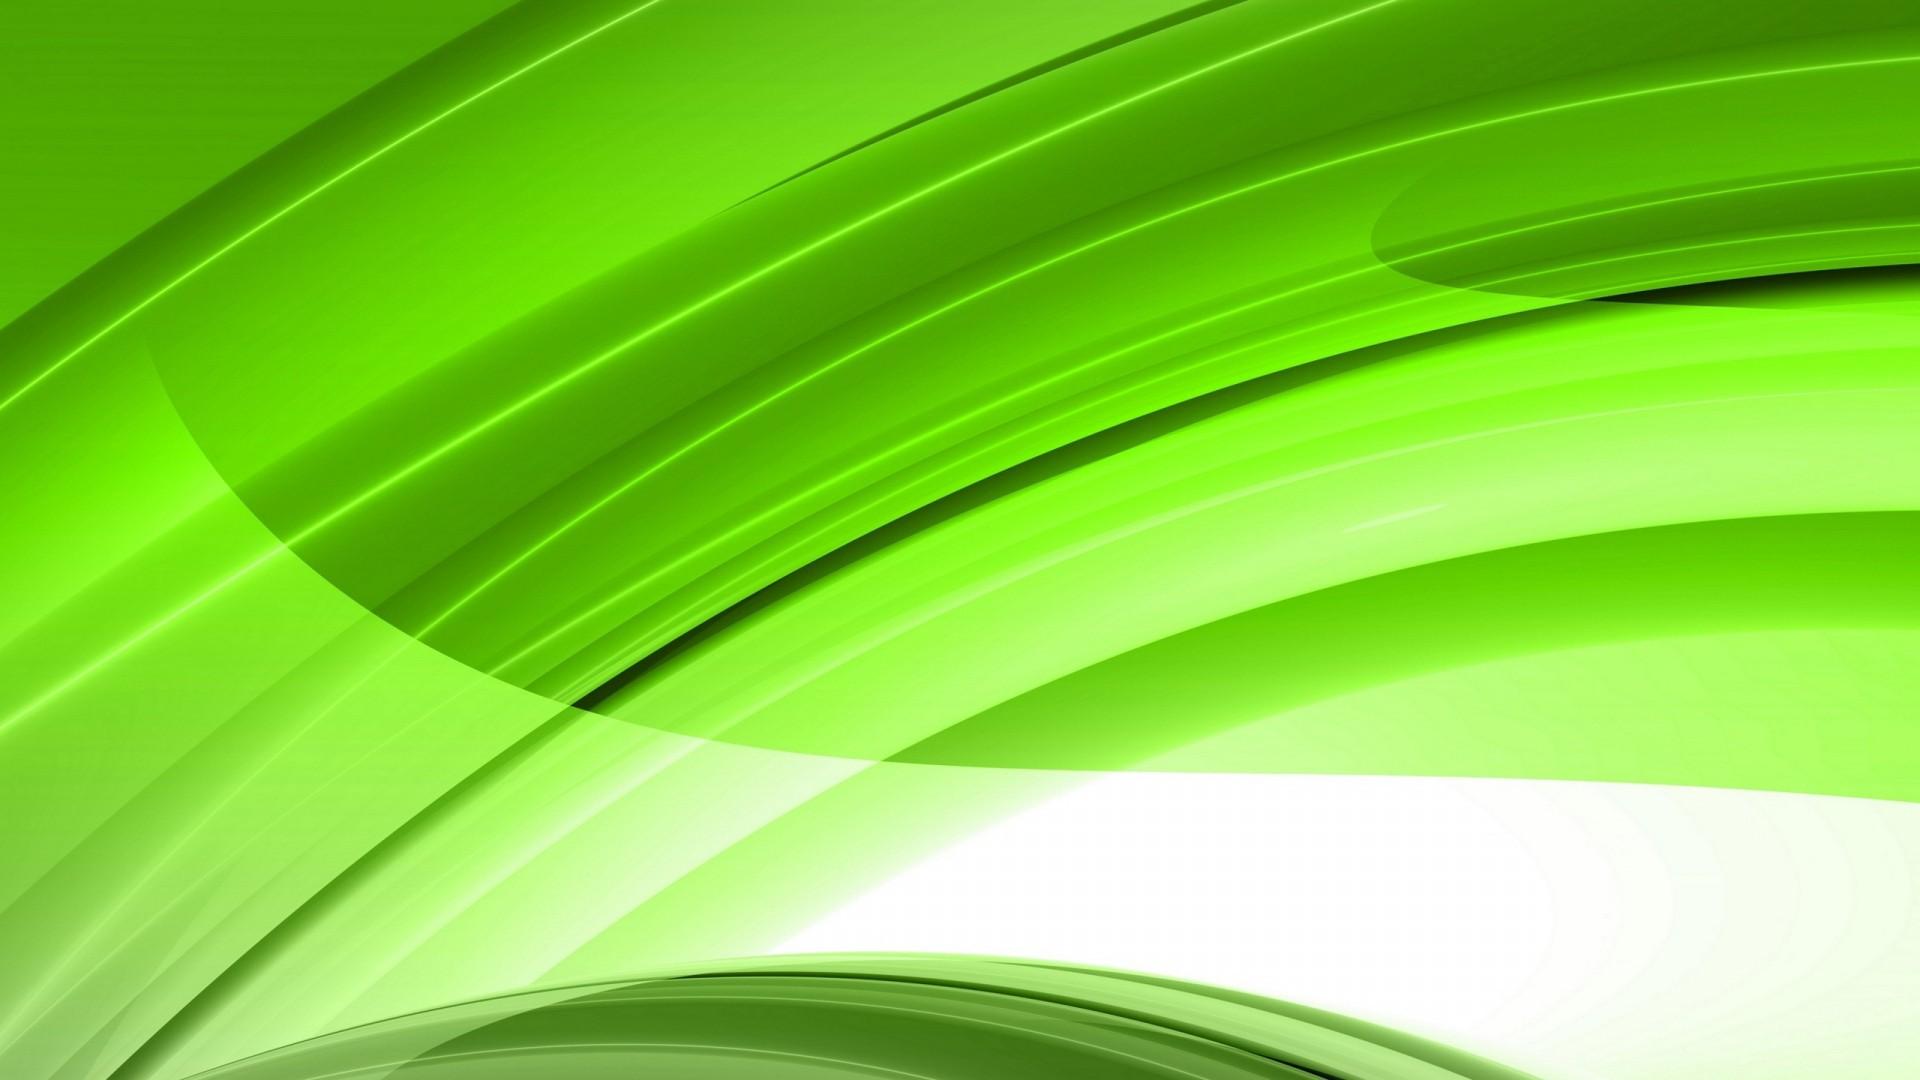 фон зеленые обои картинки